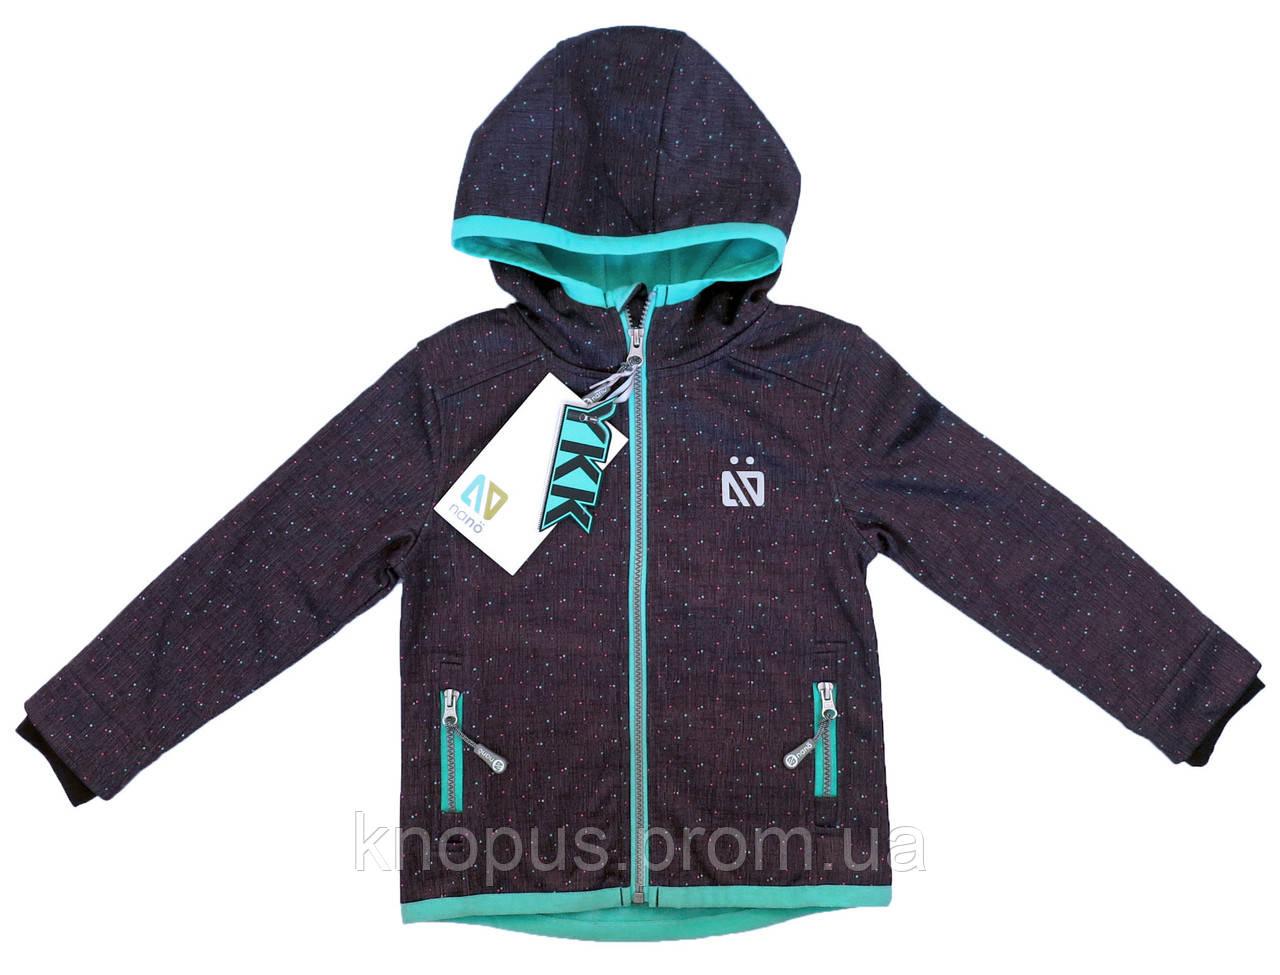 Демисезонная куртка SOFTSHELL, 1400 M S18, Mouse Confetti